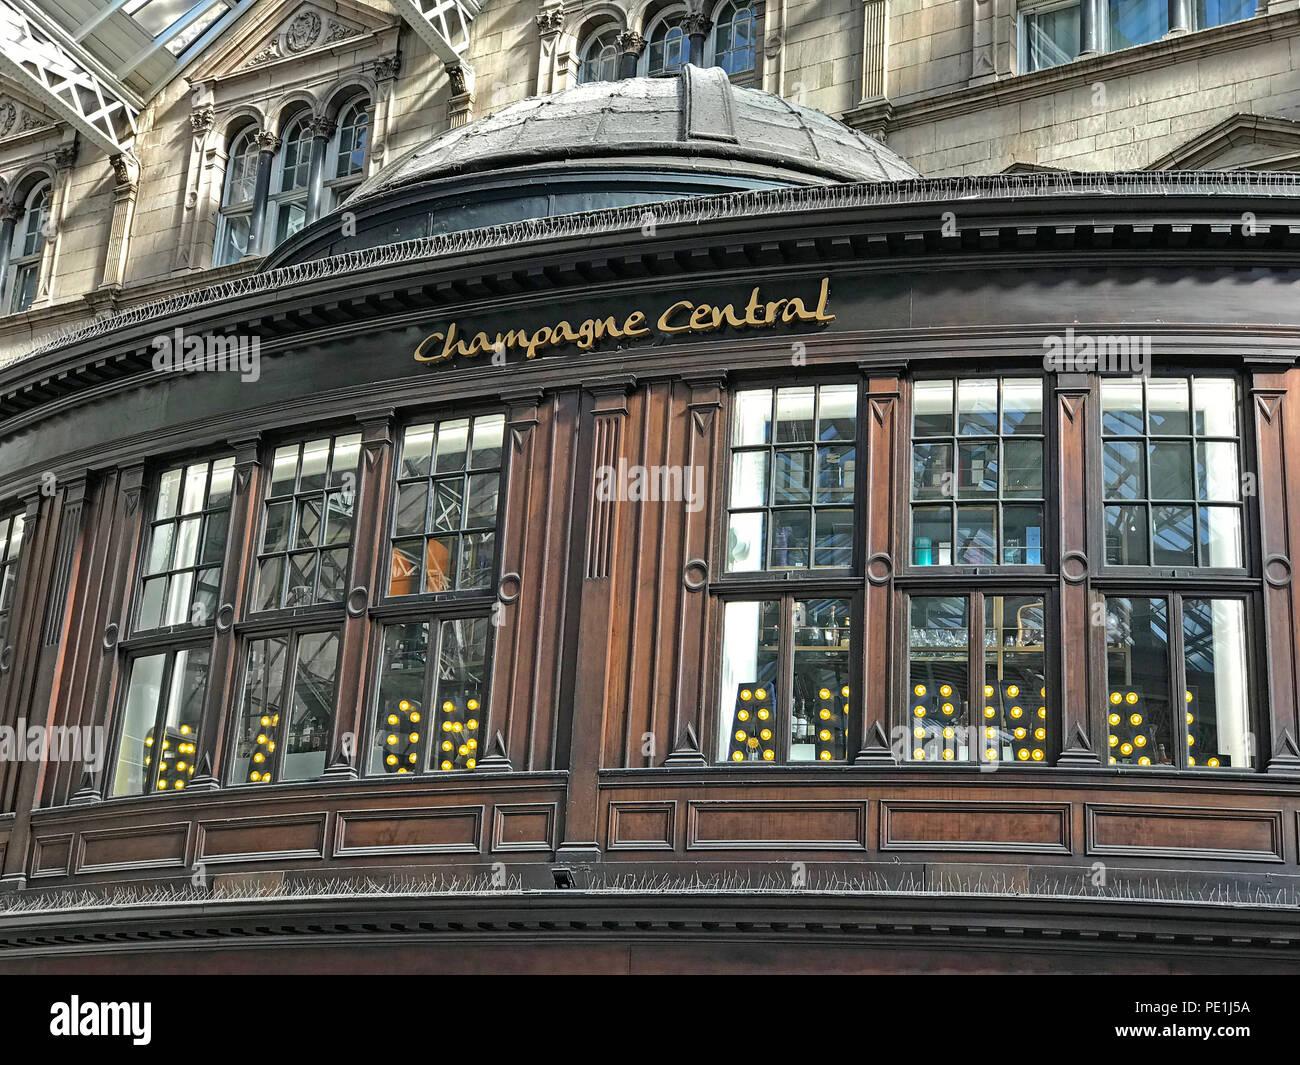 GoTonySmith @HotpixUK,Champagne Central bar,Gordon St,Scotland,UK,GoTonySmith,@HotpixUK,city centre,Gordon street,Gordon st,drinking,tourist,tourism,Champagne,Central,bar,glasgow